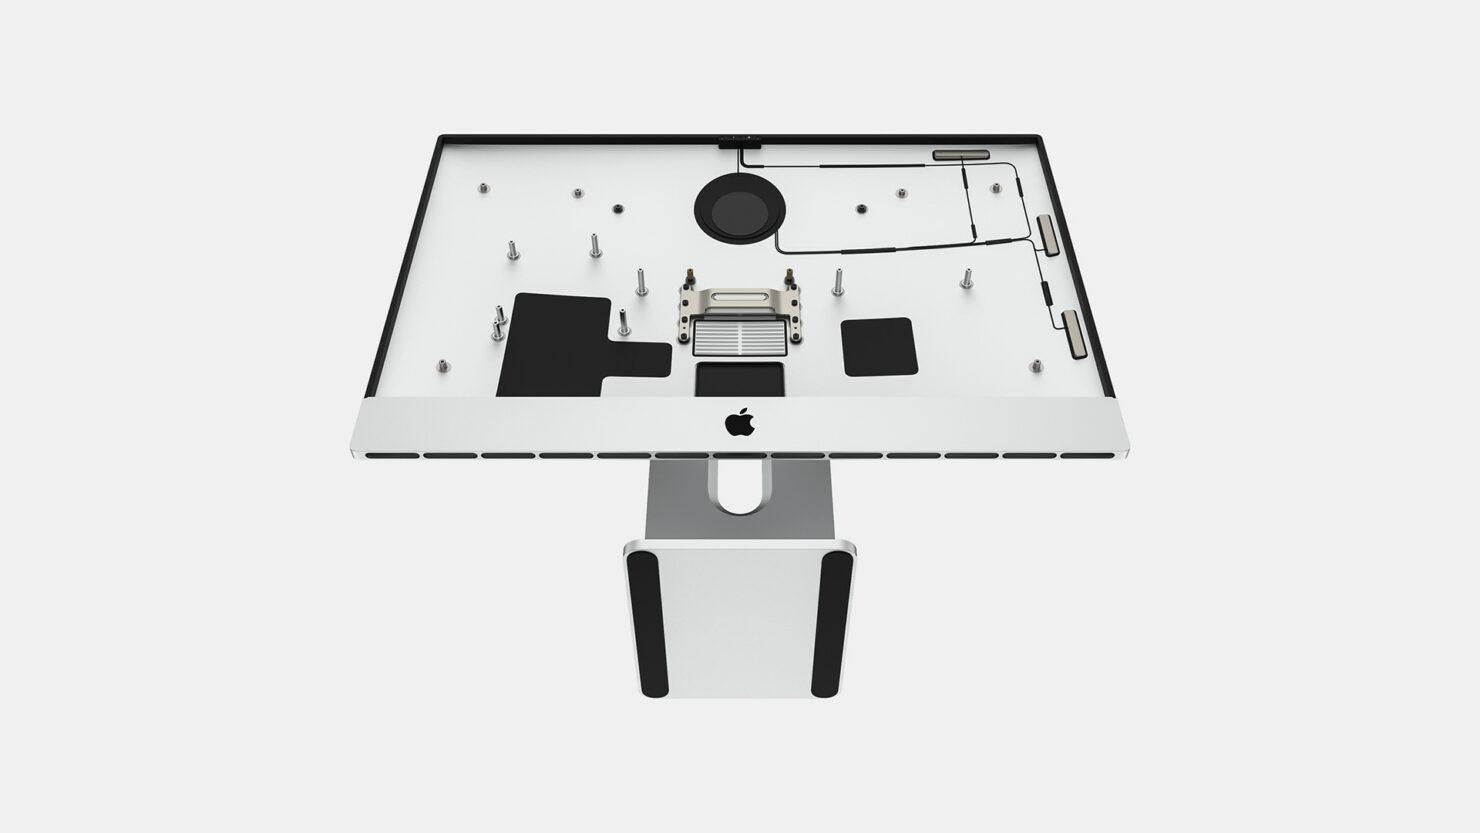 imac-concept-resembling-pro-display-xdr-5